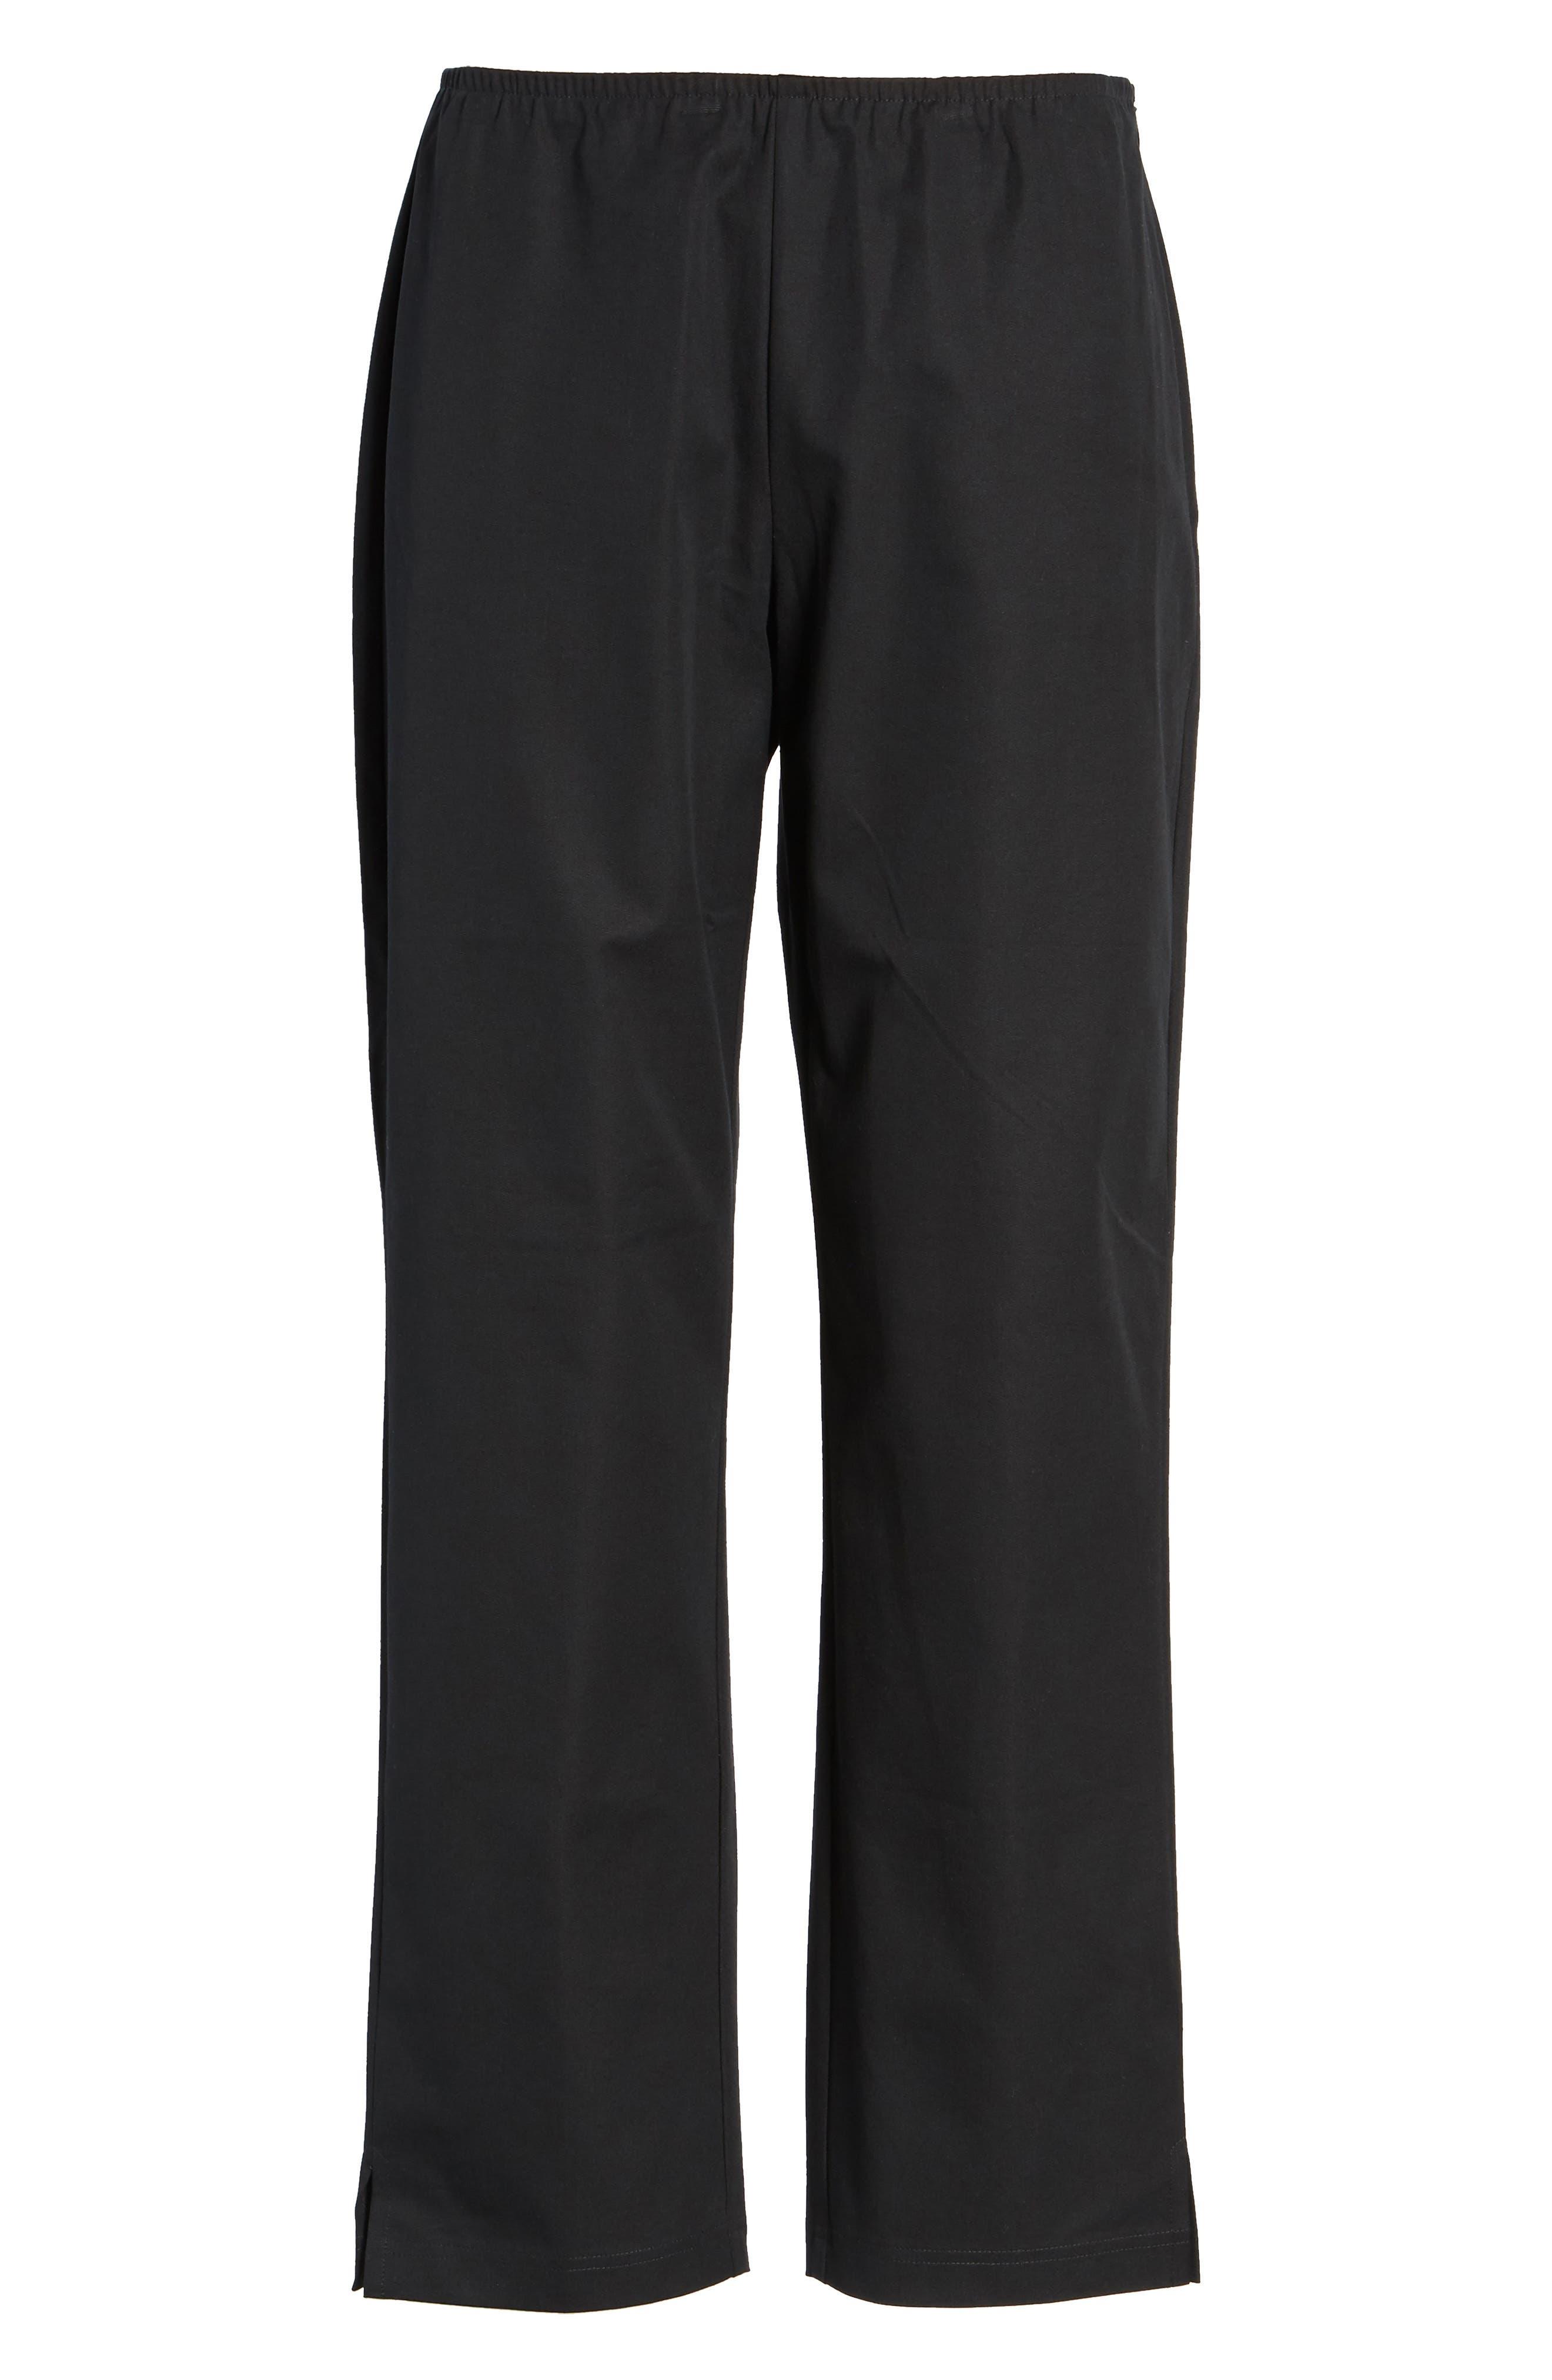 Organic Stretch Cotton Twill Ankle Pants,                             Alternate thumbnail 3, color,                             Black